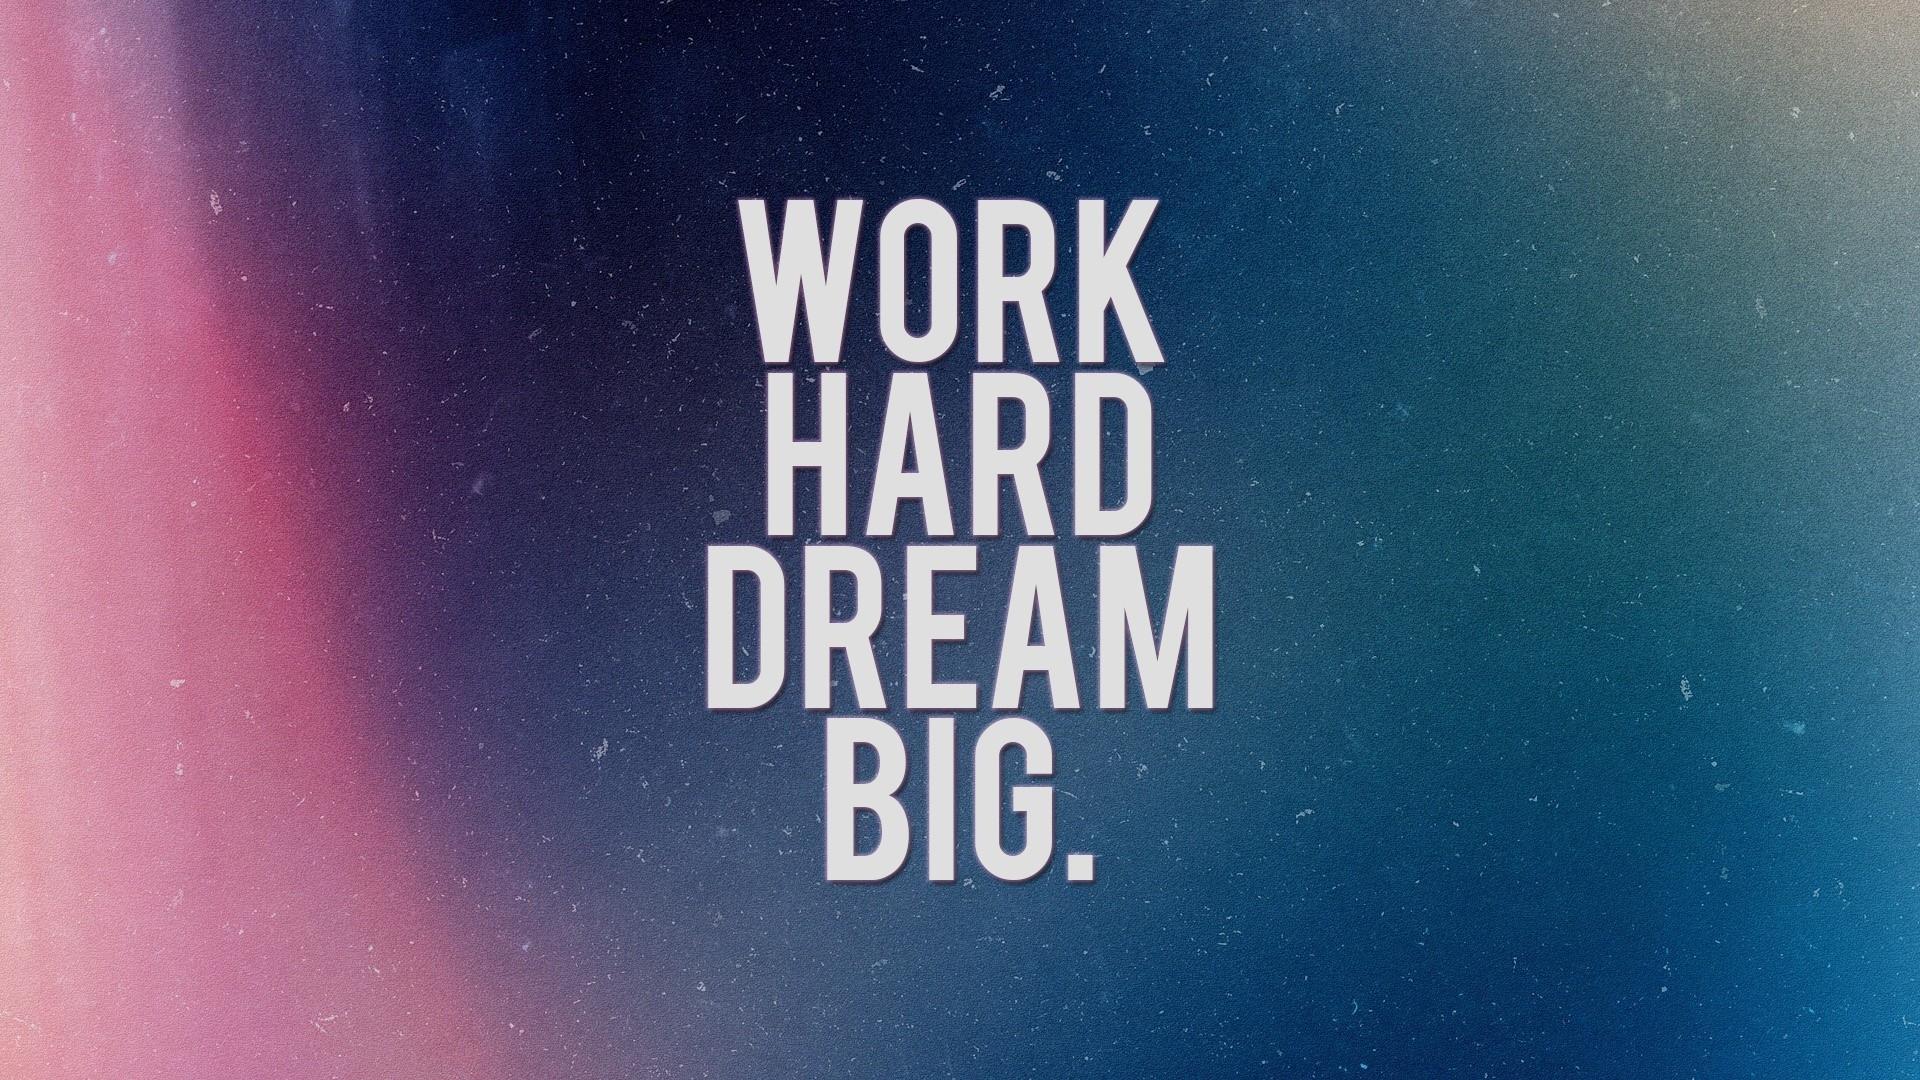 fond d'ecran work hard dream big - wallpaper